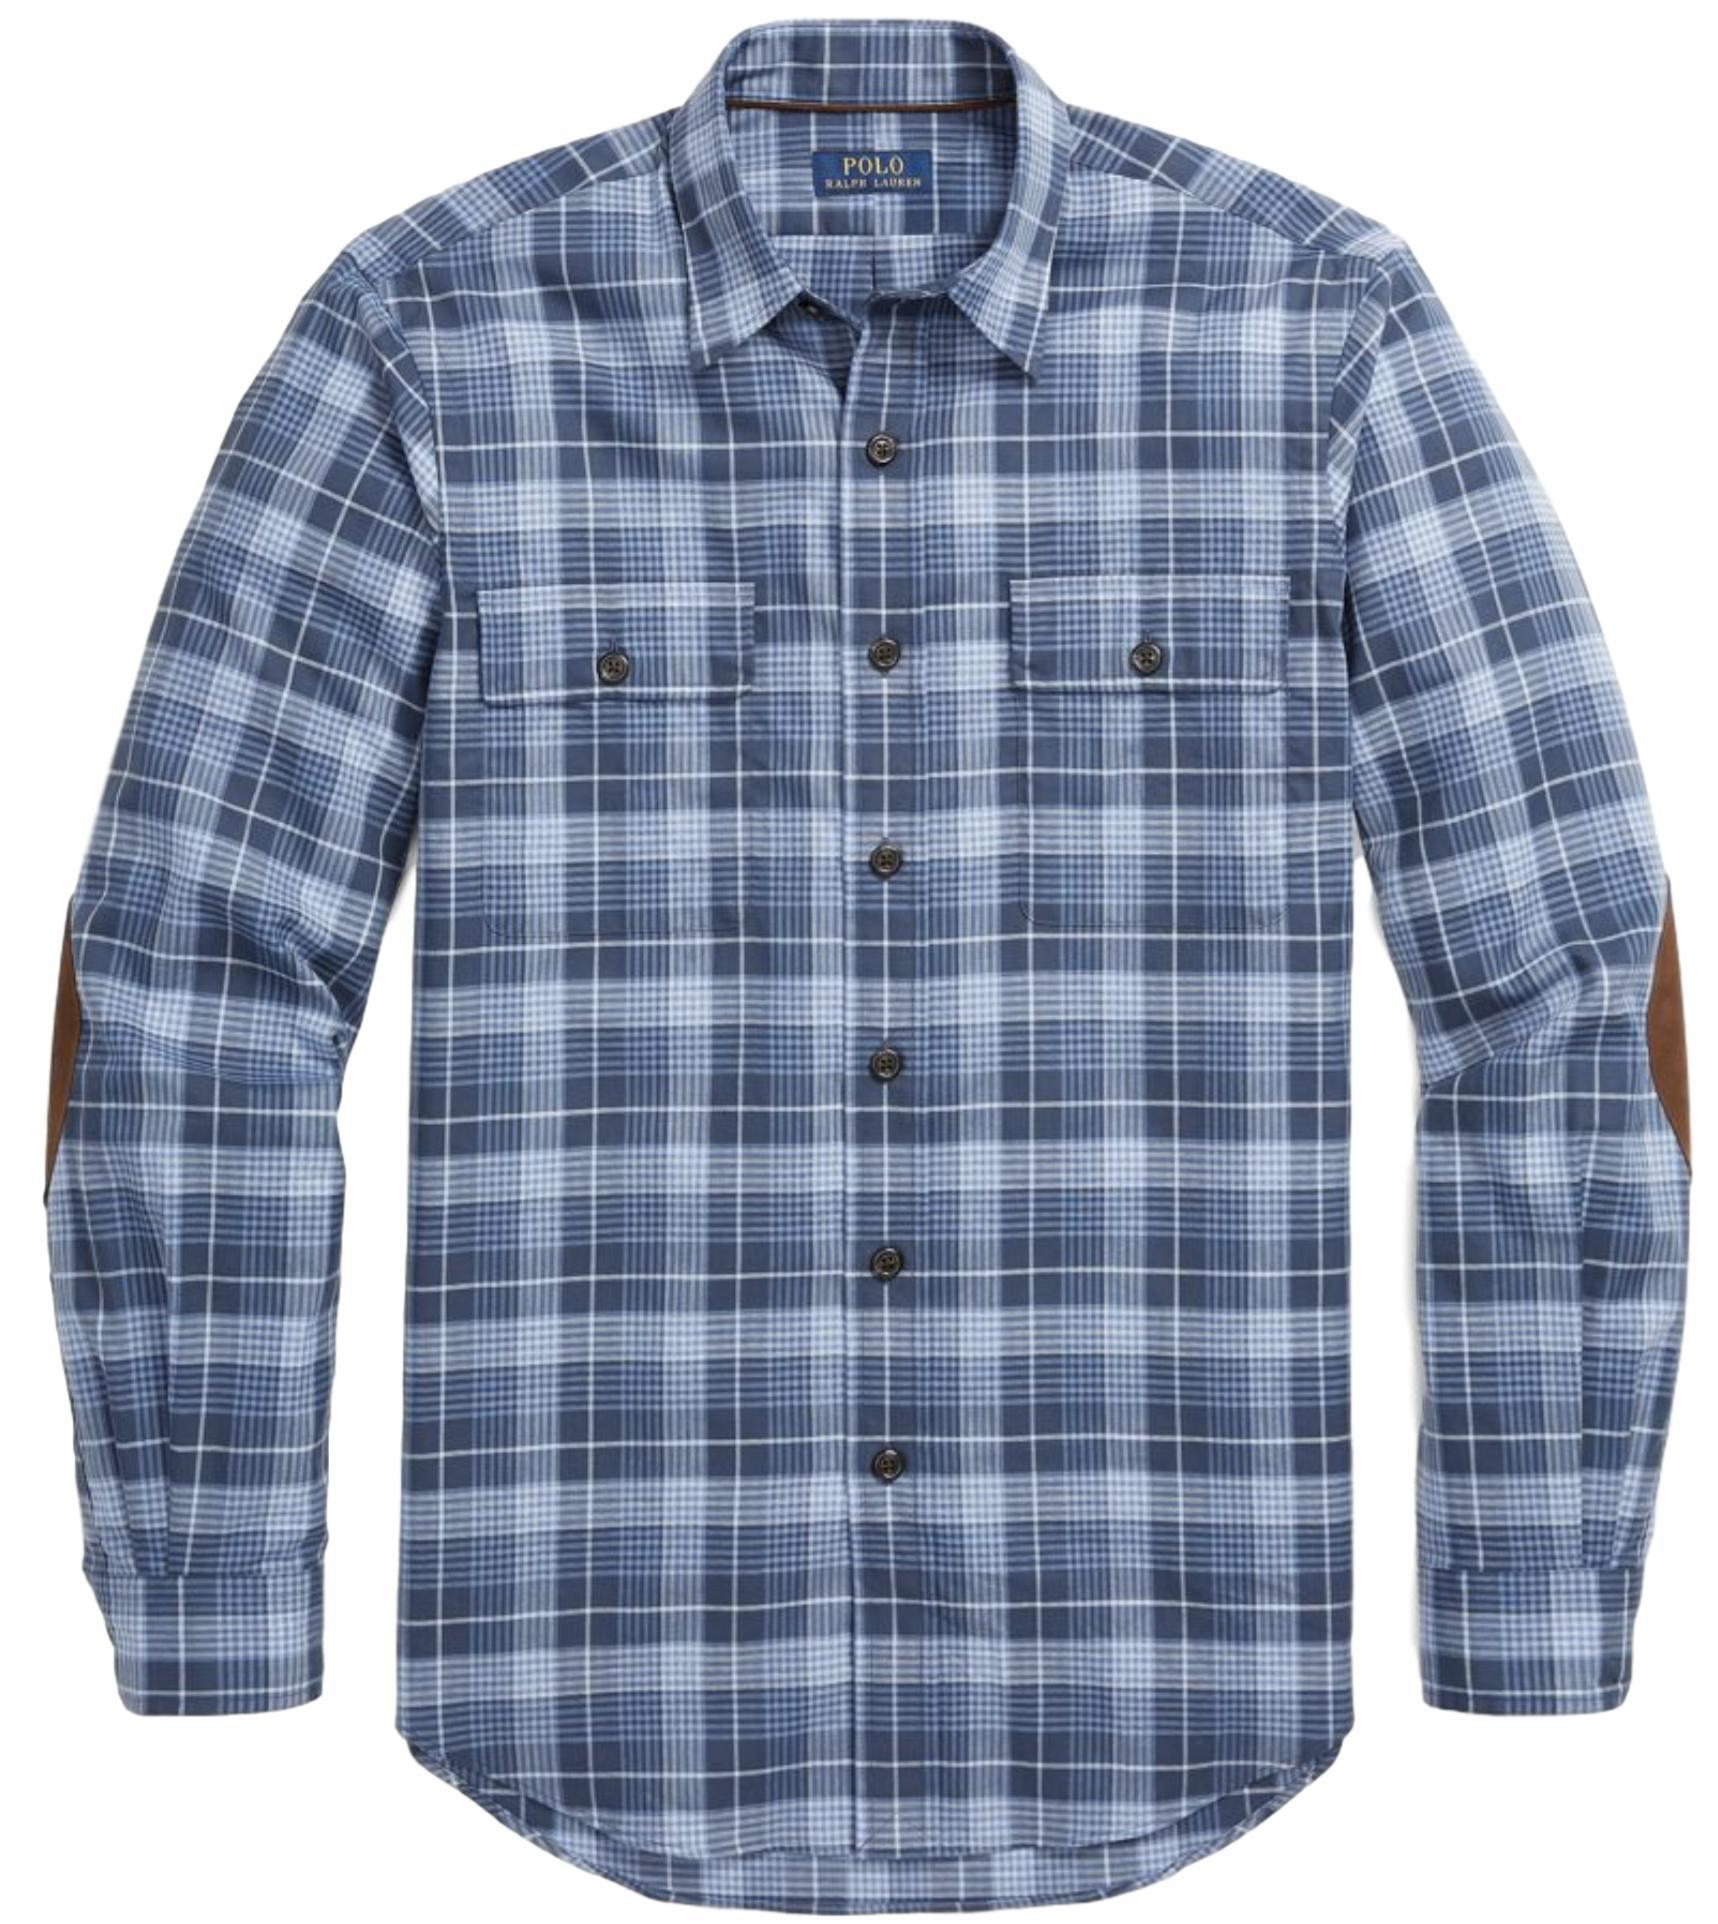 Polo Ralph Lauren Men's Long Sleeve Button Down Shirt-ShadeMulti-Large